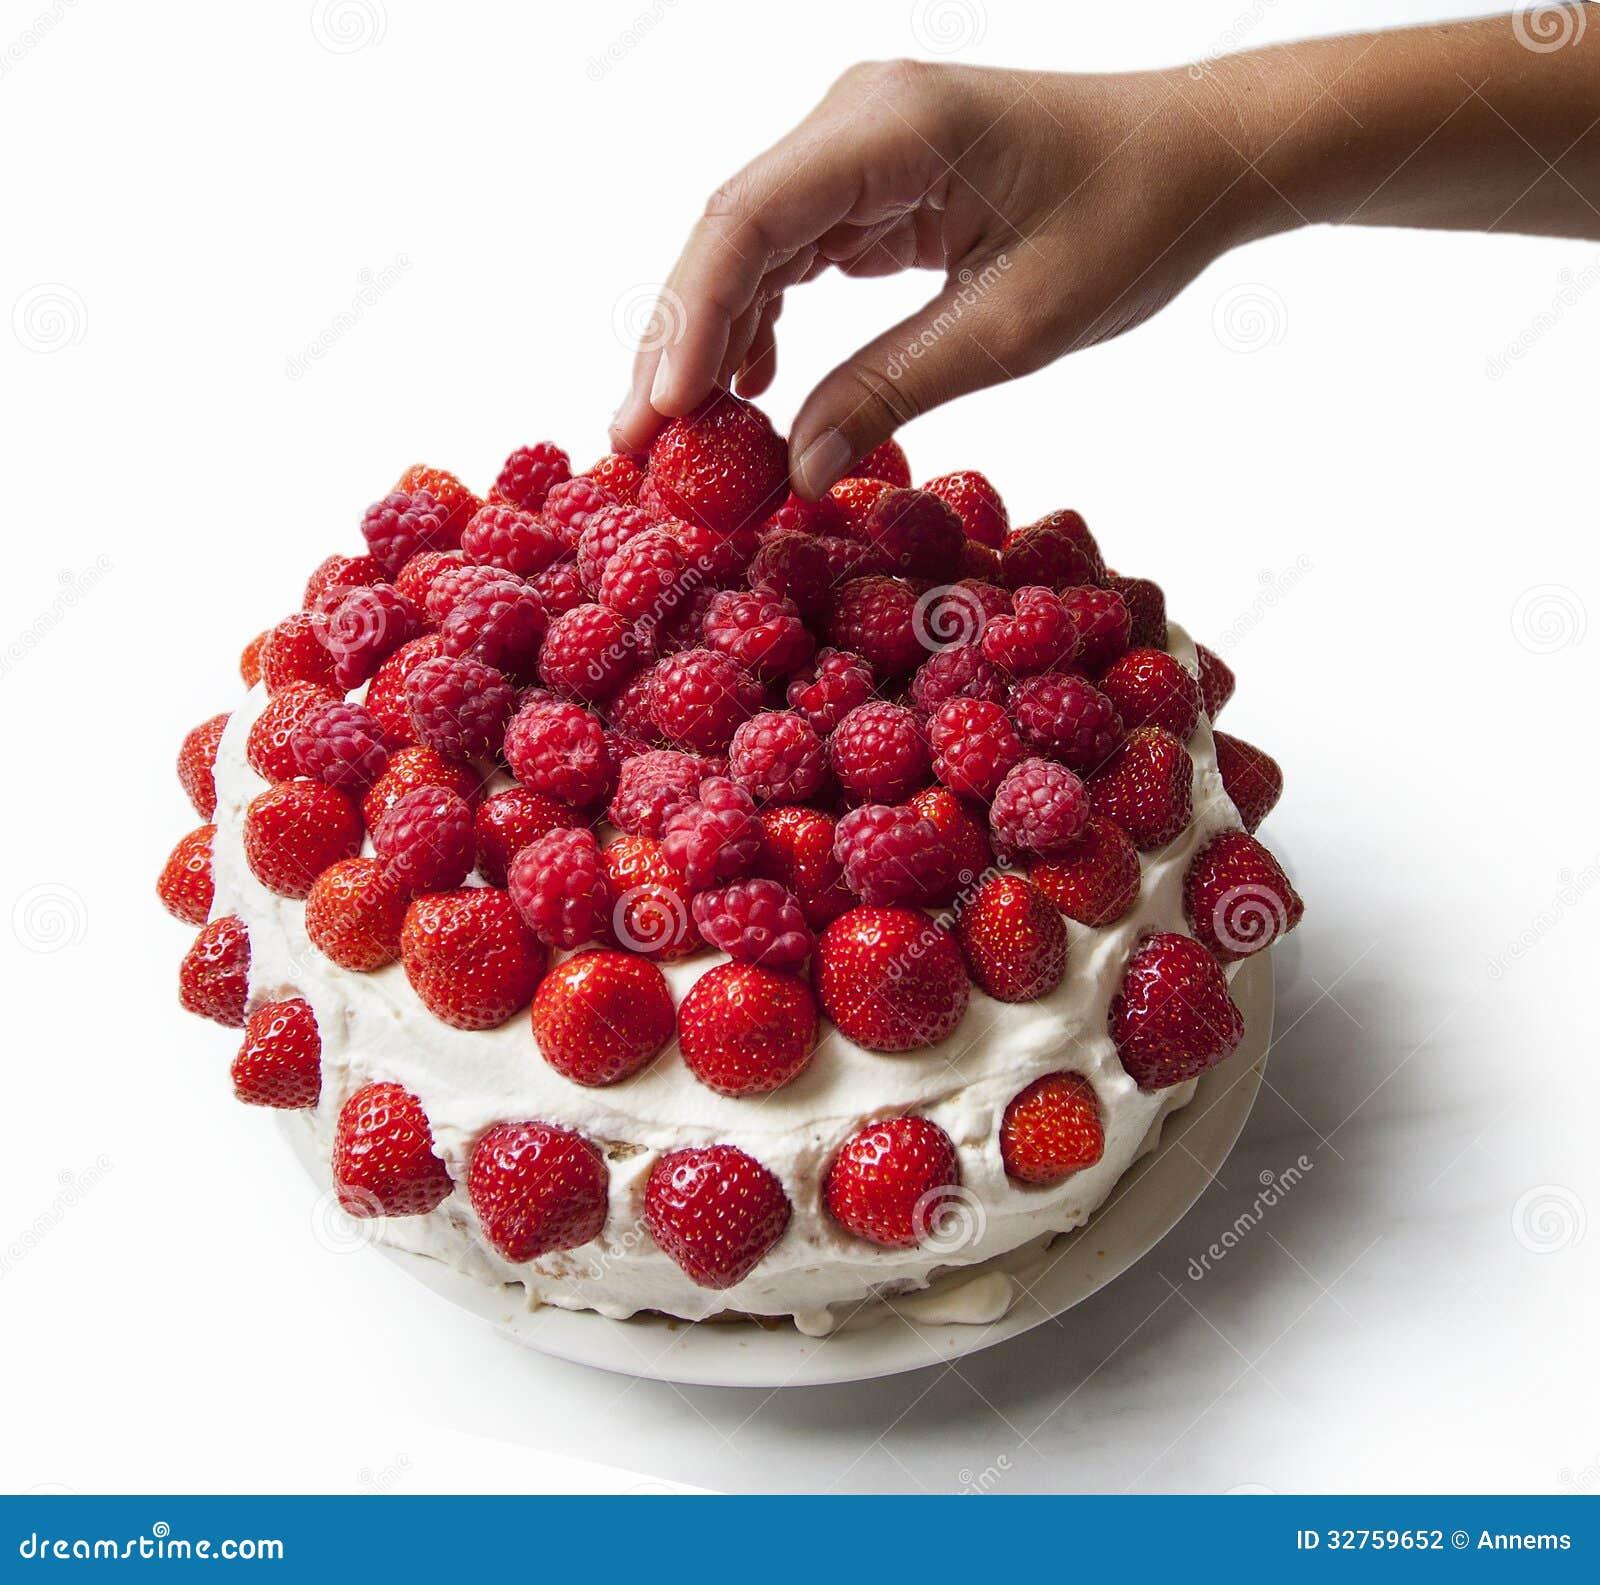 recipe: strawberry and raspberry cake [23]